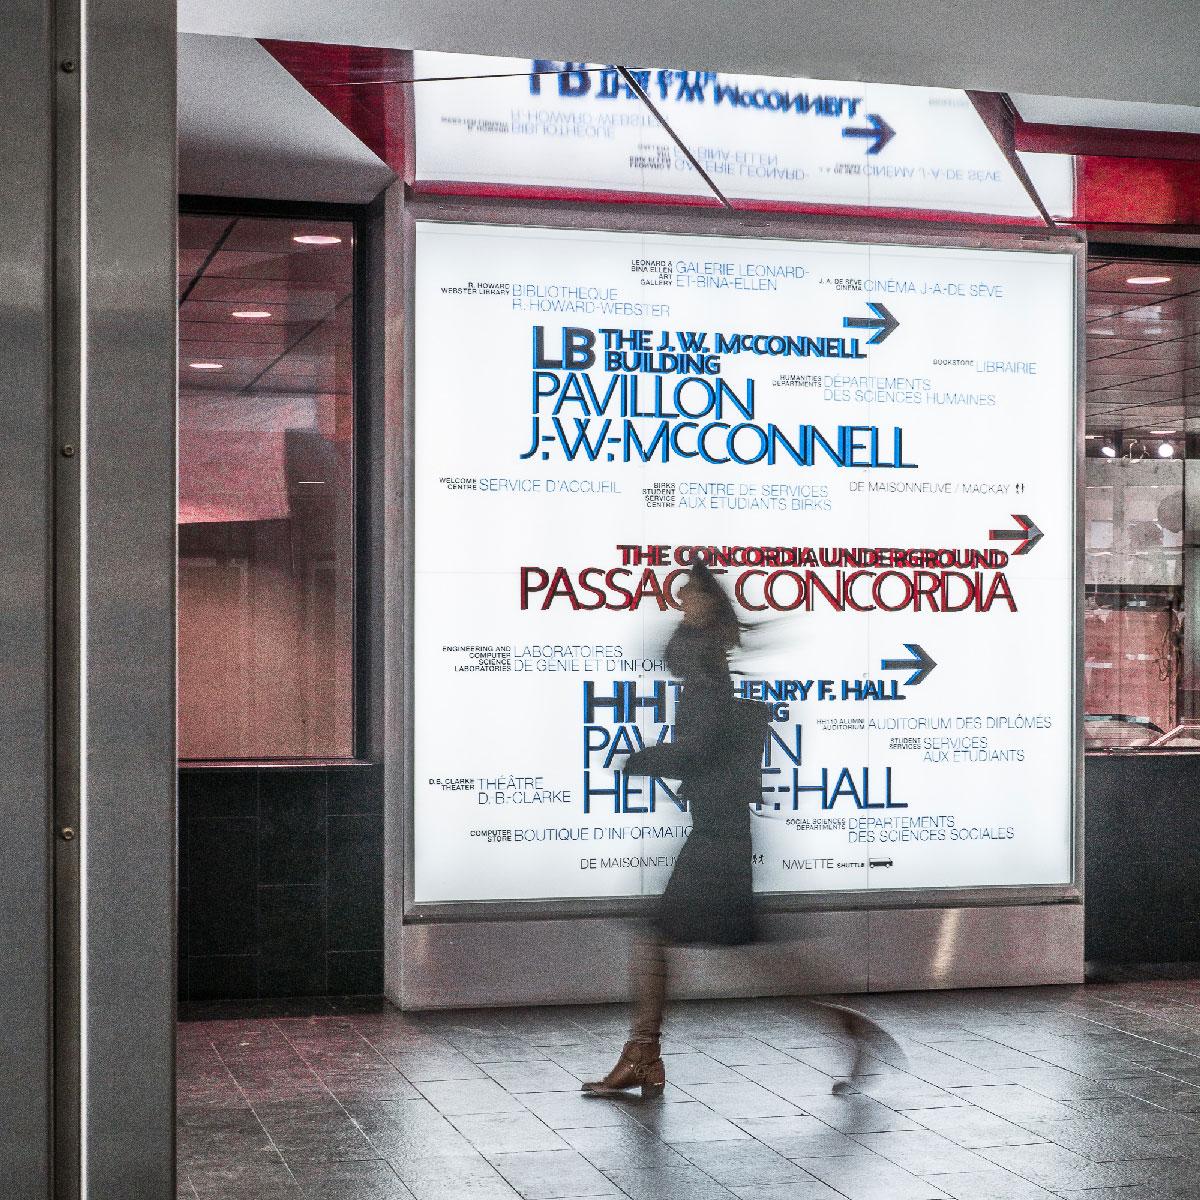 Affichage U. Concordia